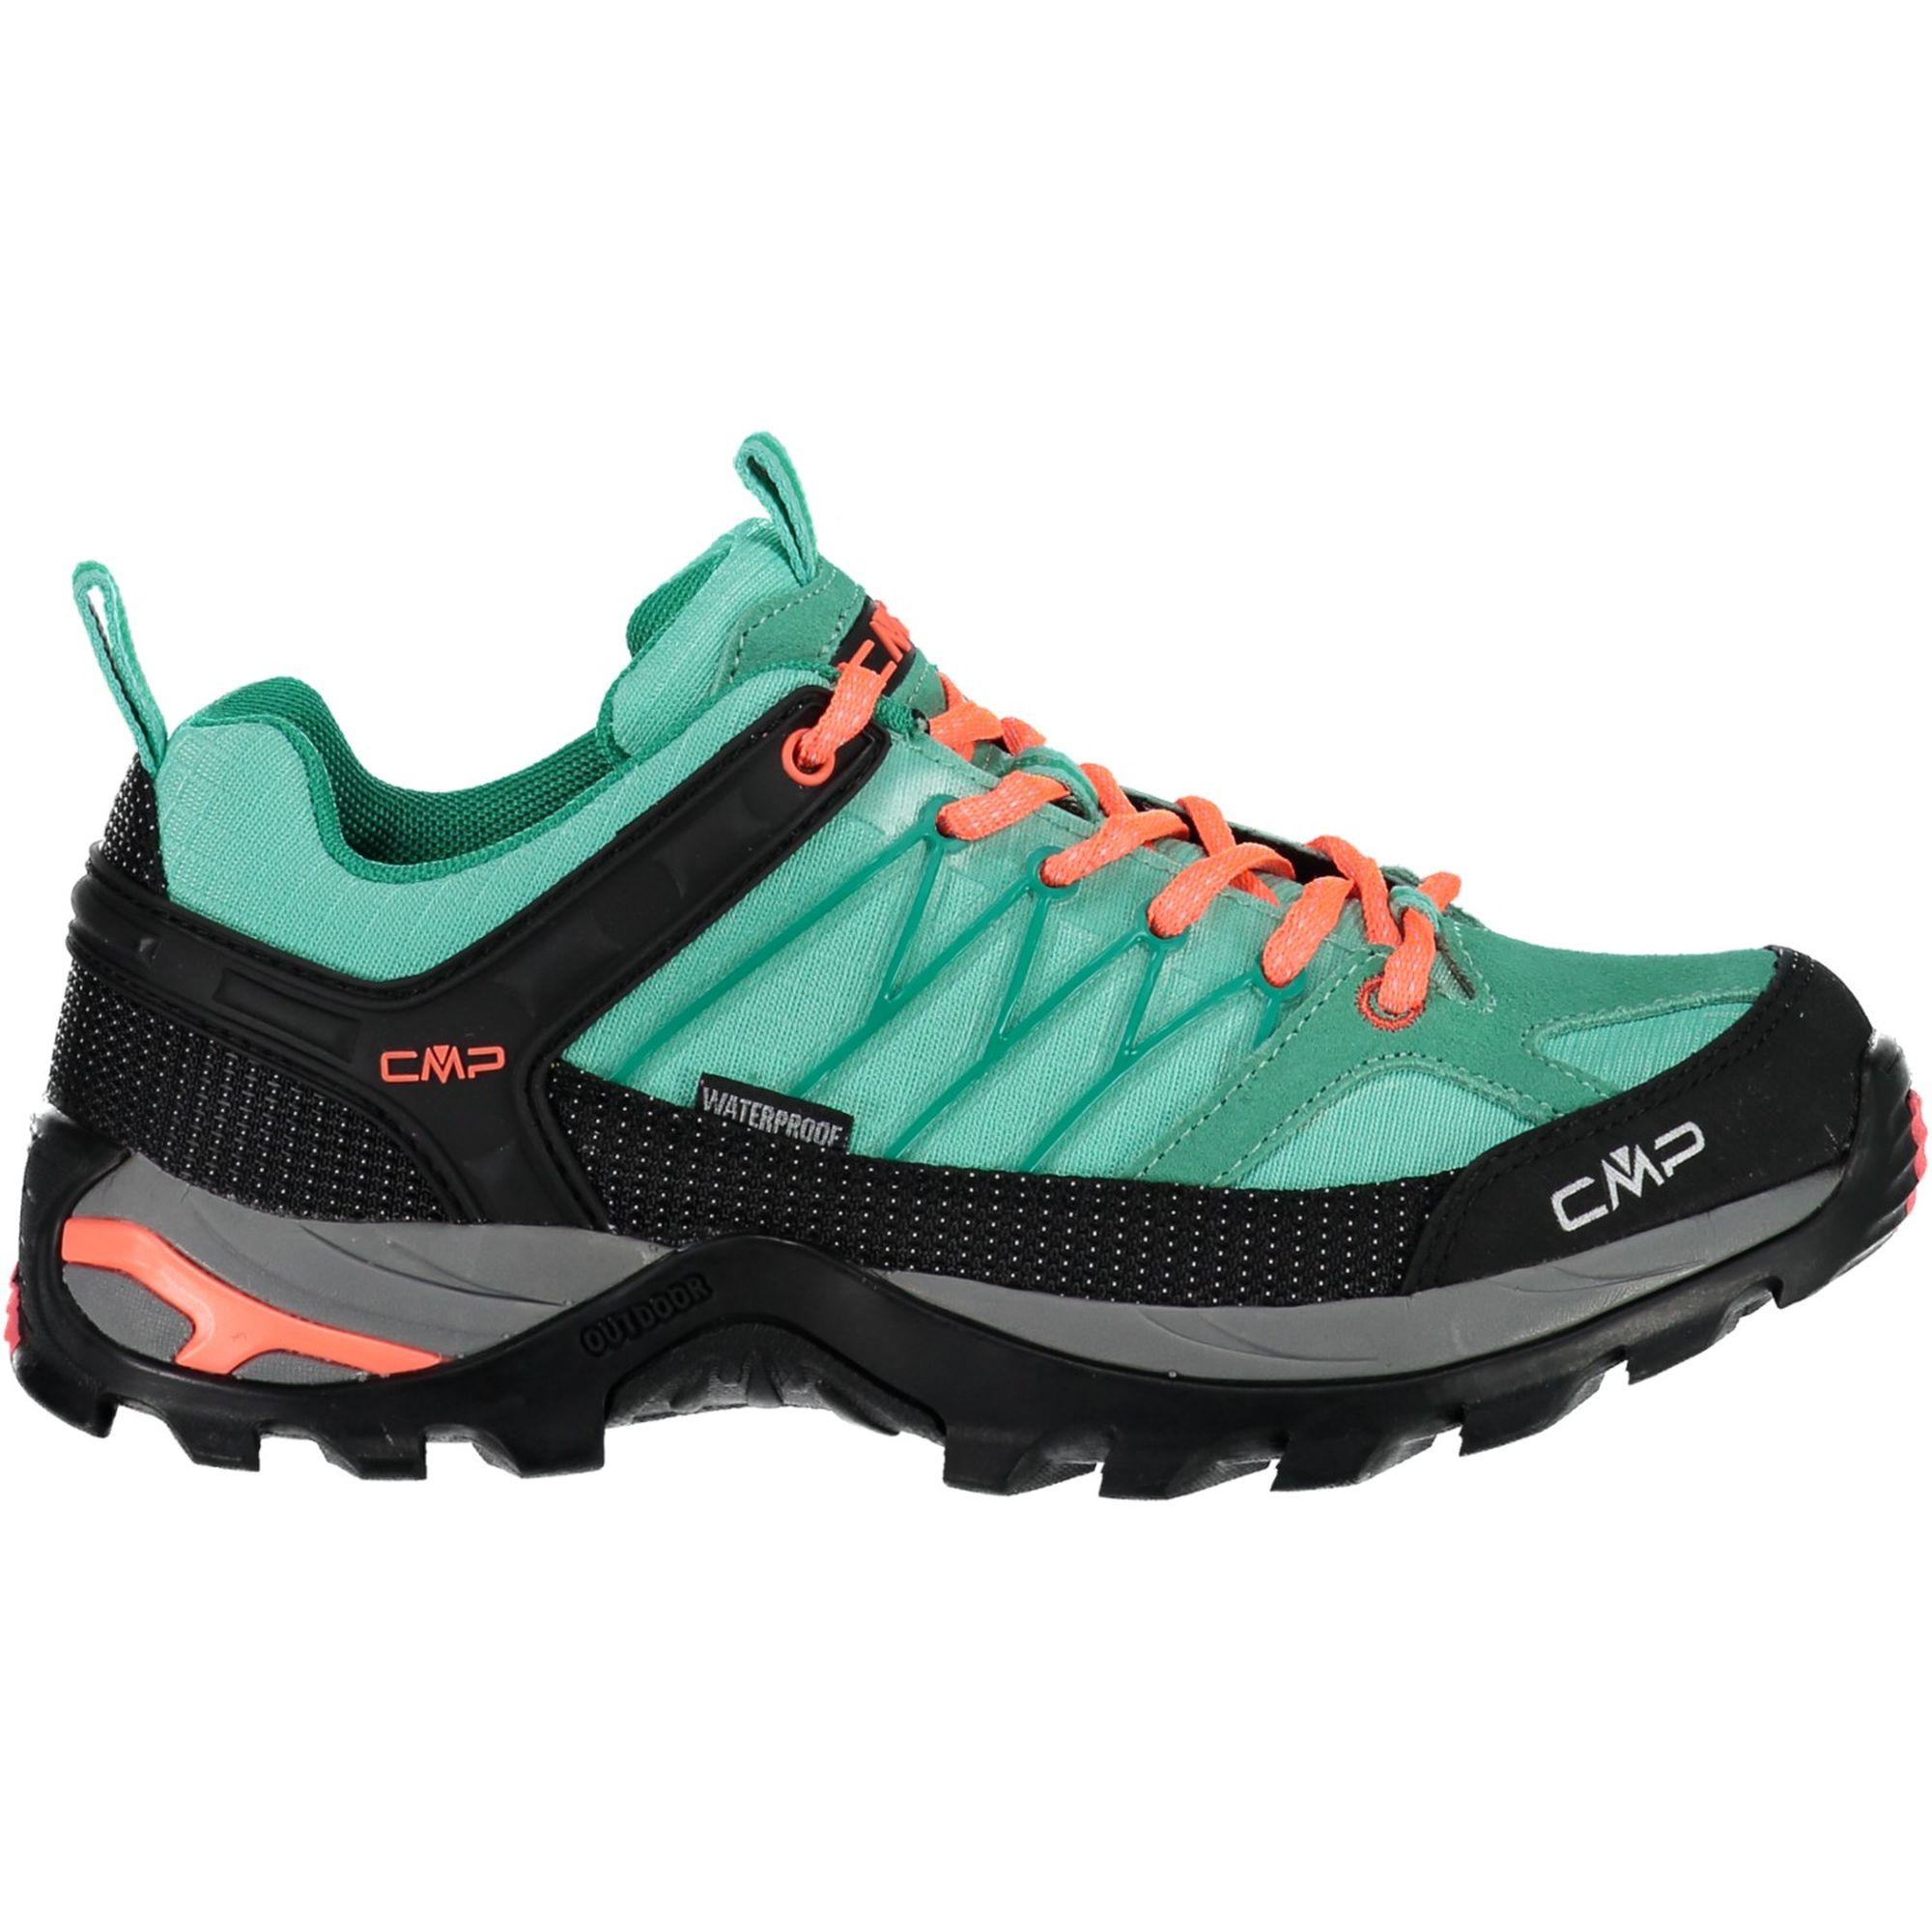 Details about CMP Trekking Shoes Outdoorschuh Rigel Low Wmn Trekking Shoes Wp Turquoise Mesh